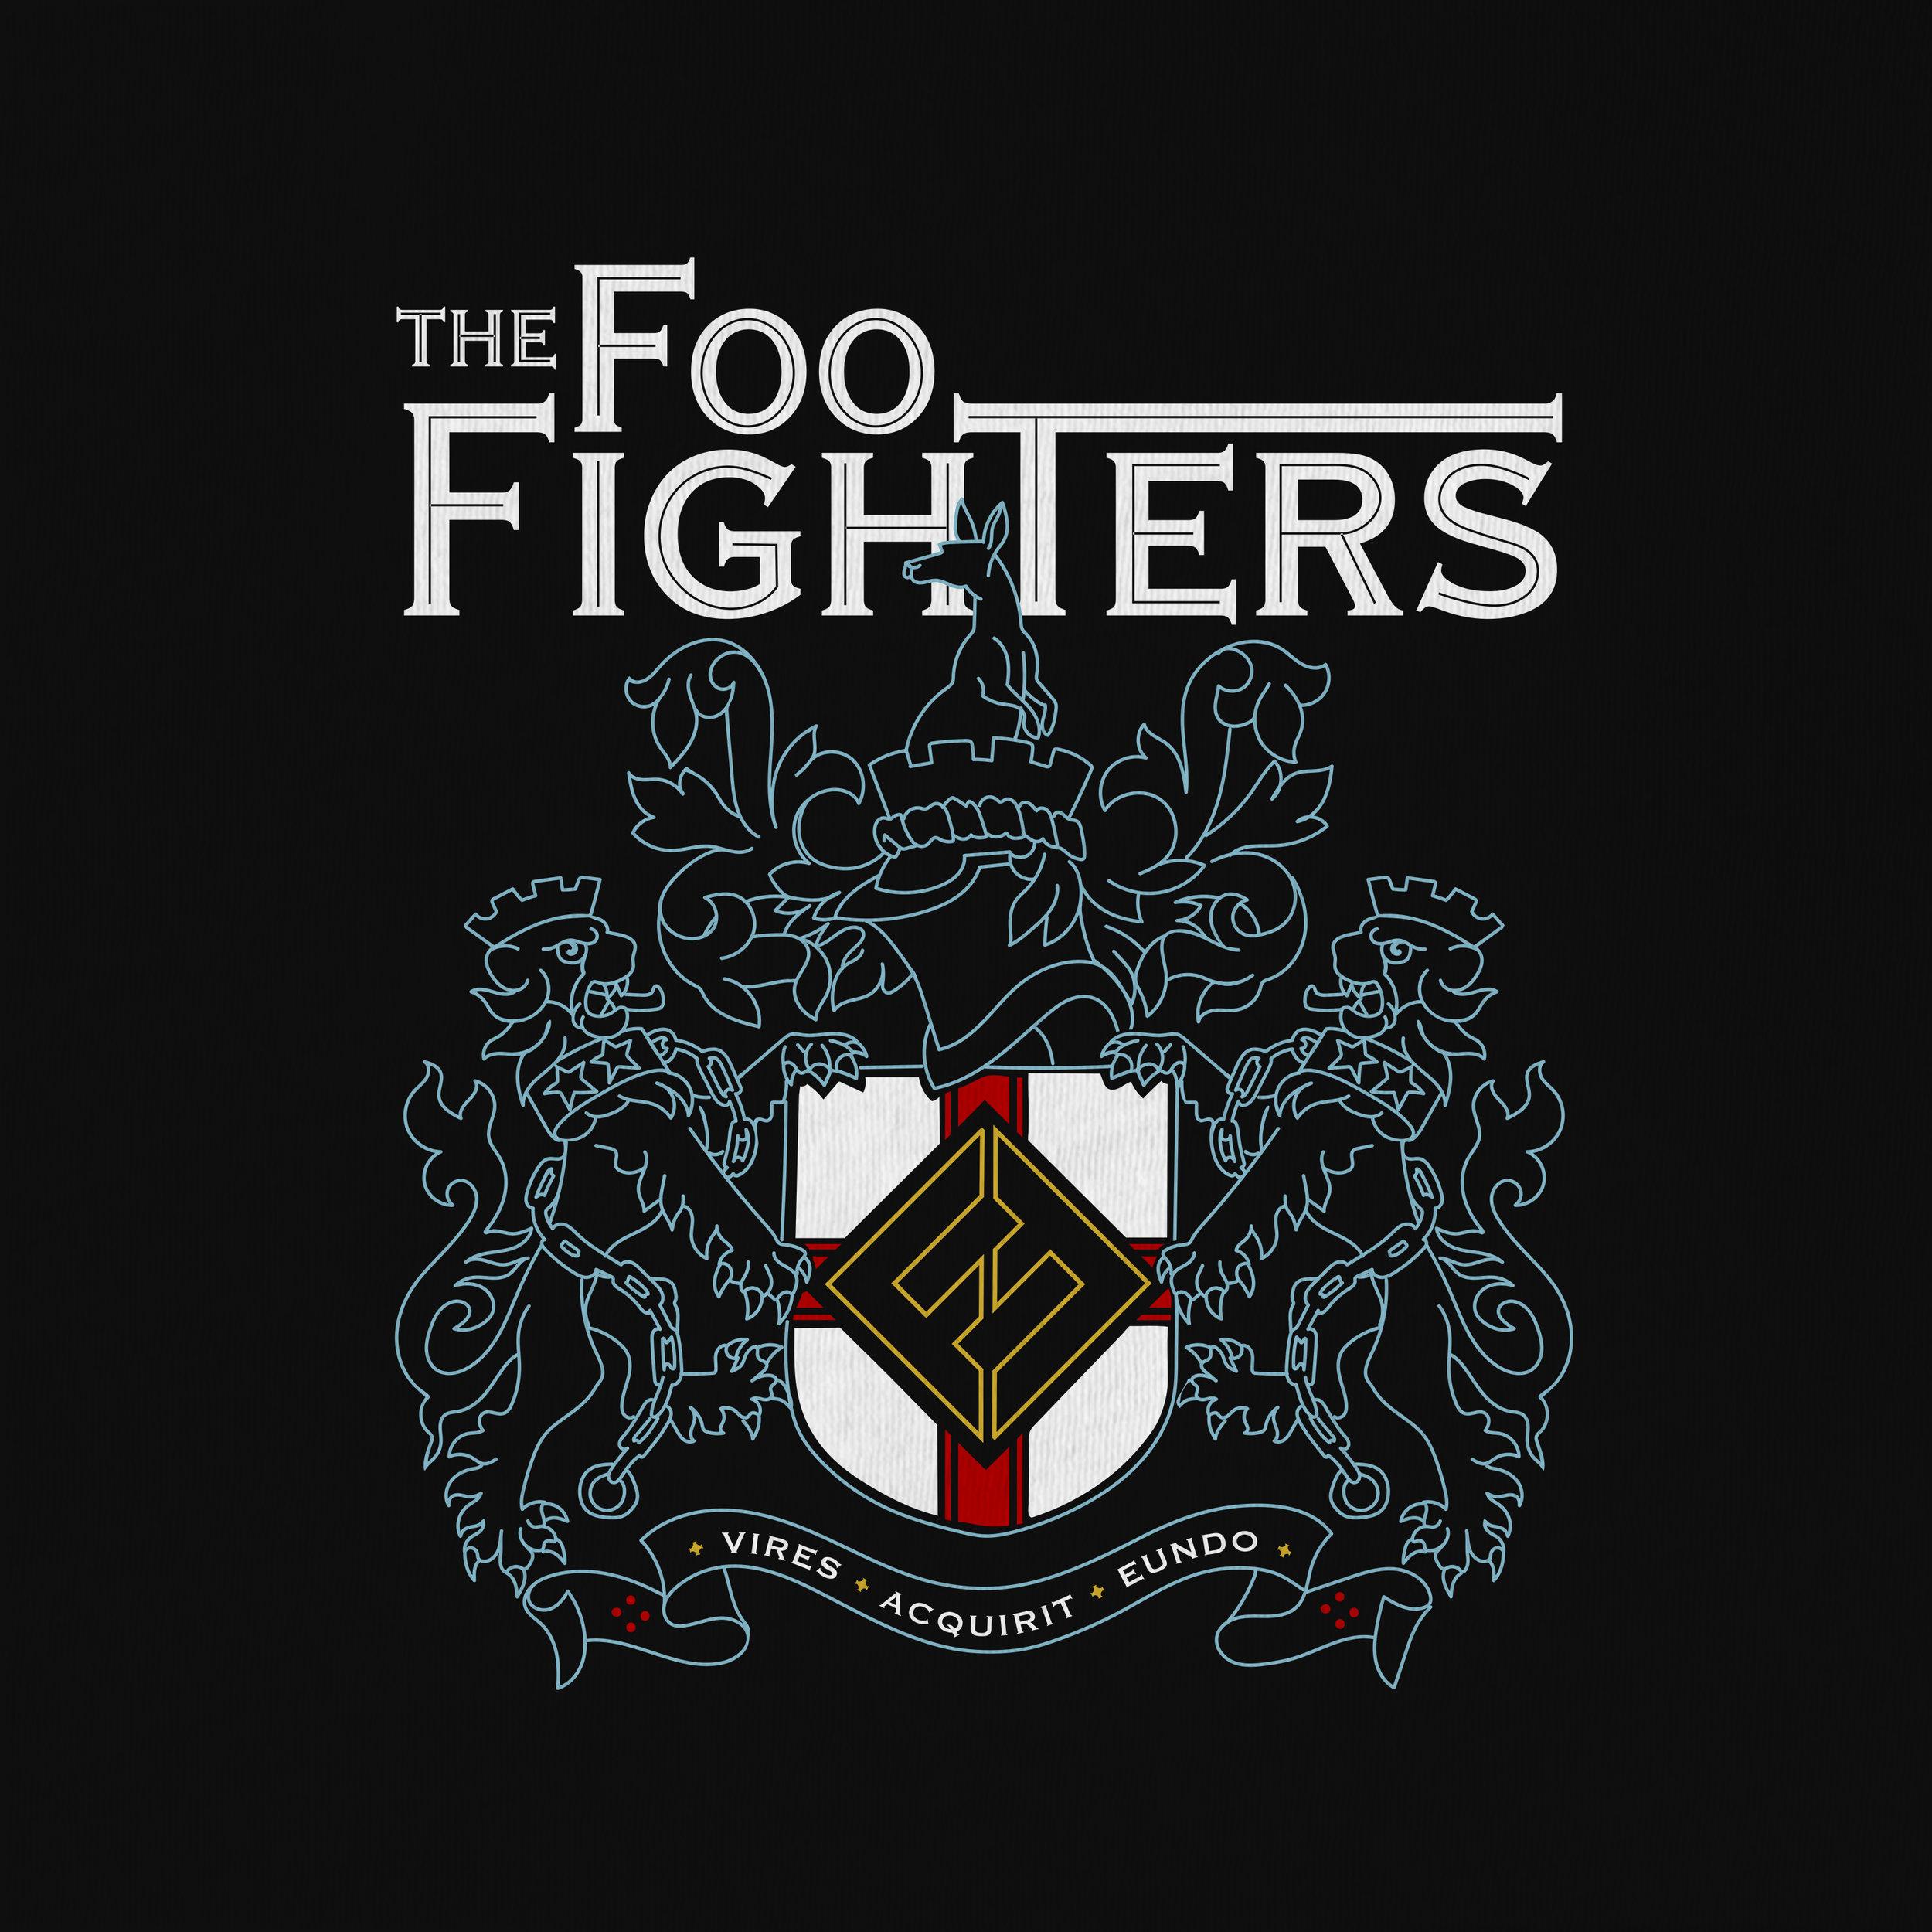 foo-fighters-sydney.jpg